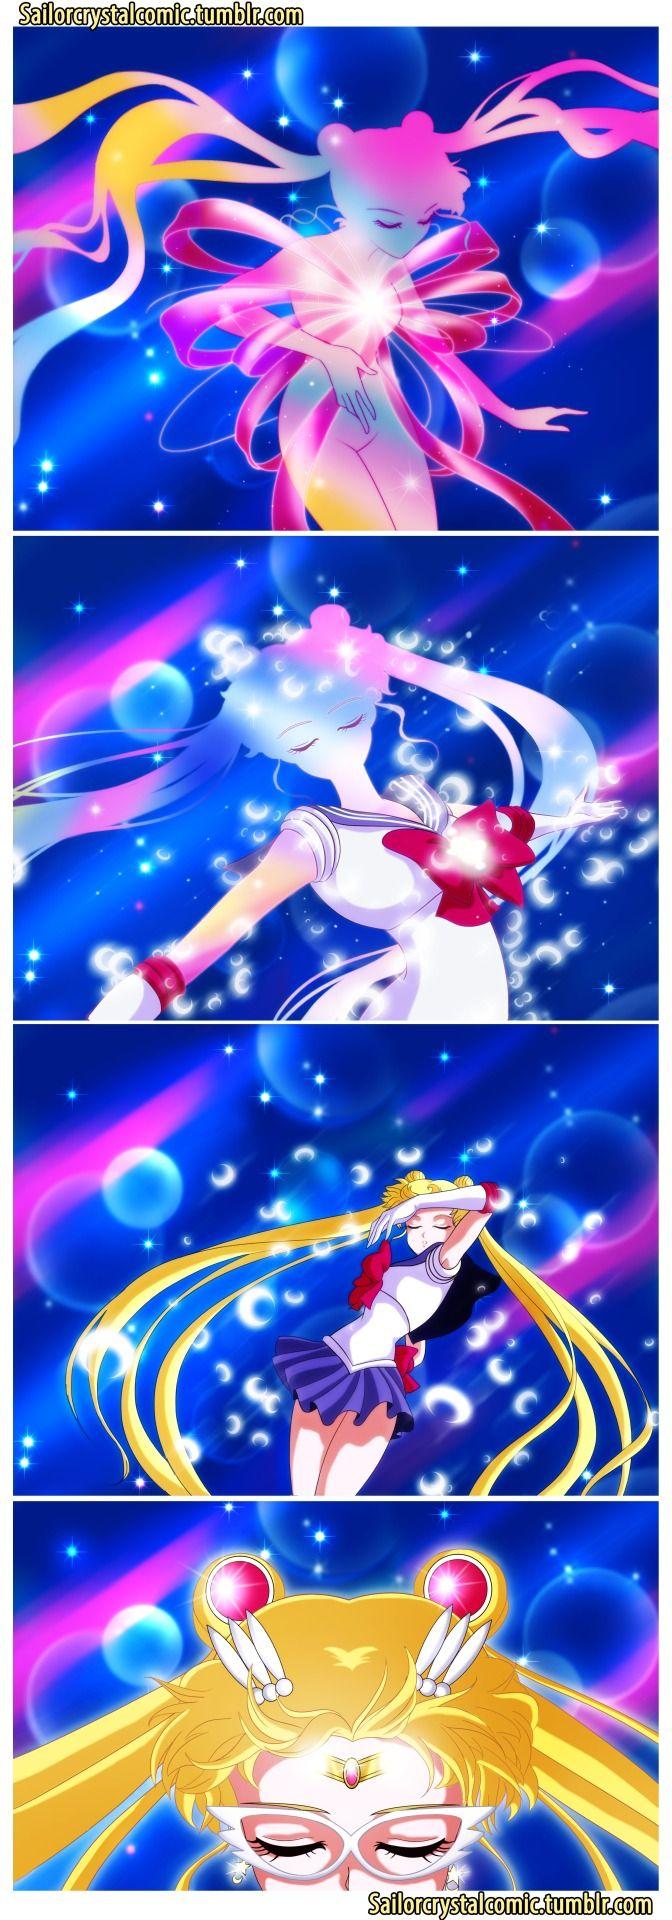 Sailor Moon Crystal comic: Usagi's first time transformating (manga story-wise).